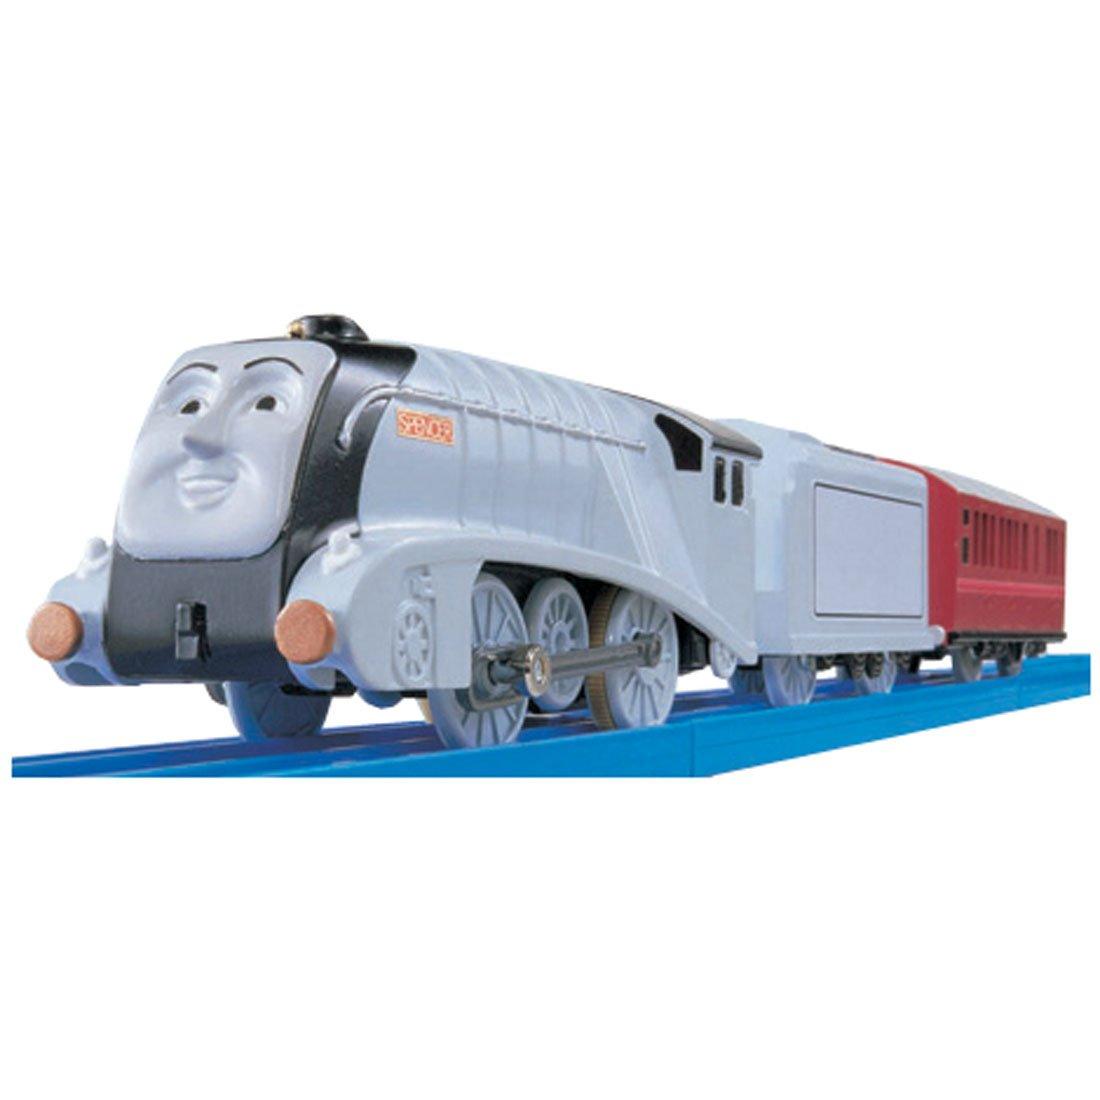 Plarail - THOMAS & FRIENDS: TS-10 Plarail Spencer (Model Train) [Toy] (japan import) Takara Tomy